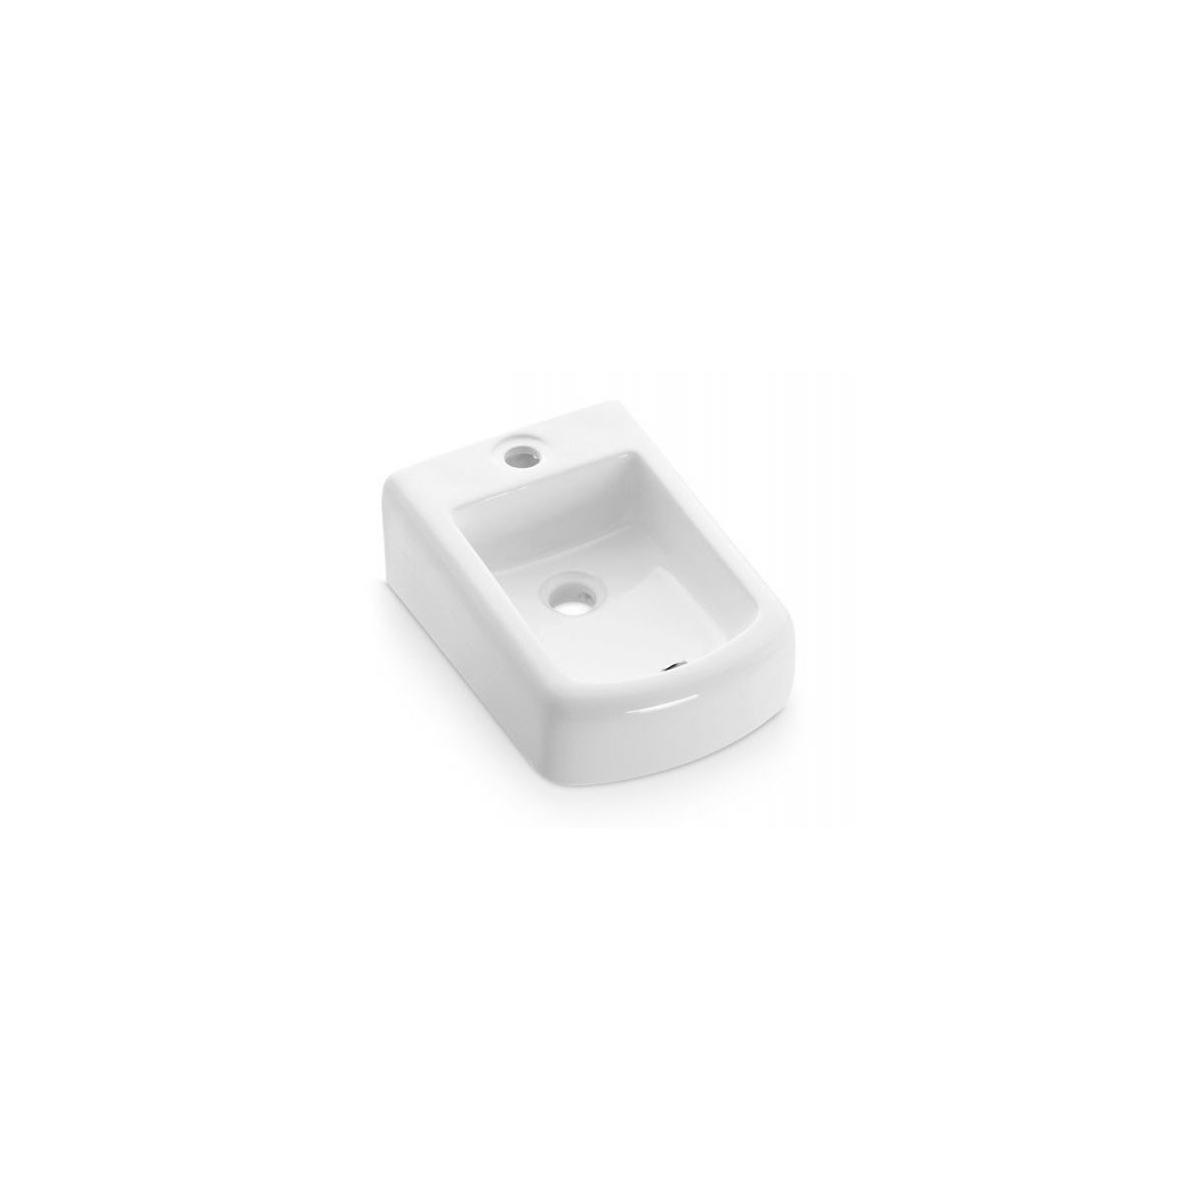 Lavabo Mini Space - Lavabos mini - Marca The Bathco